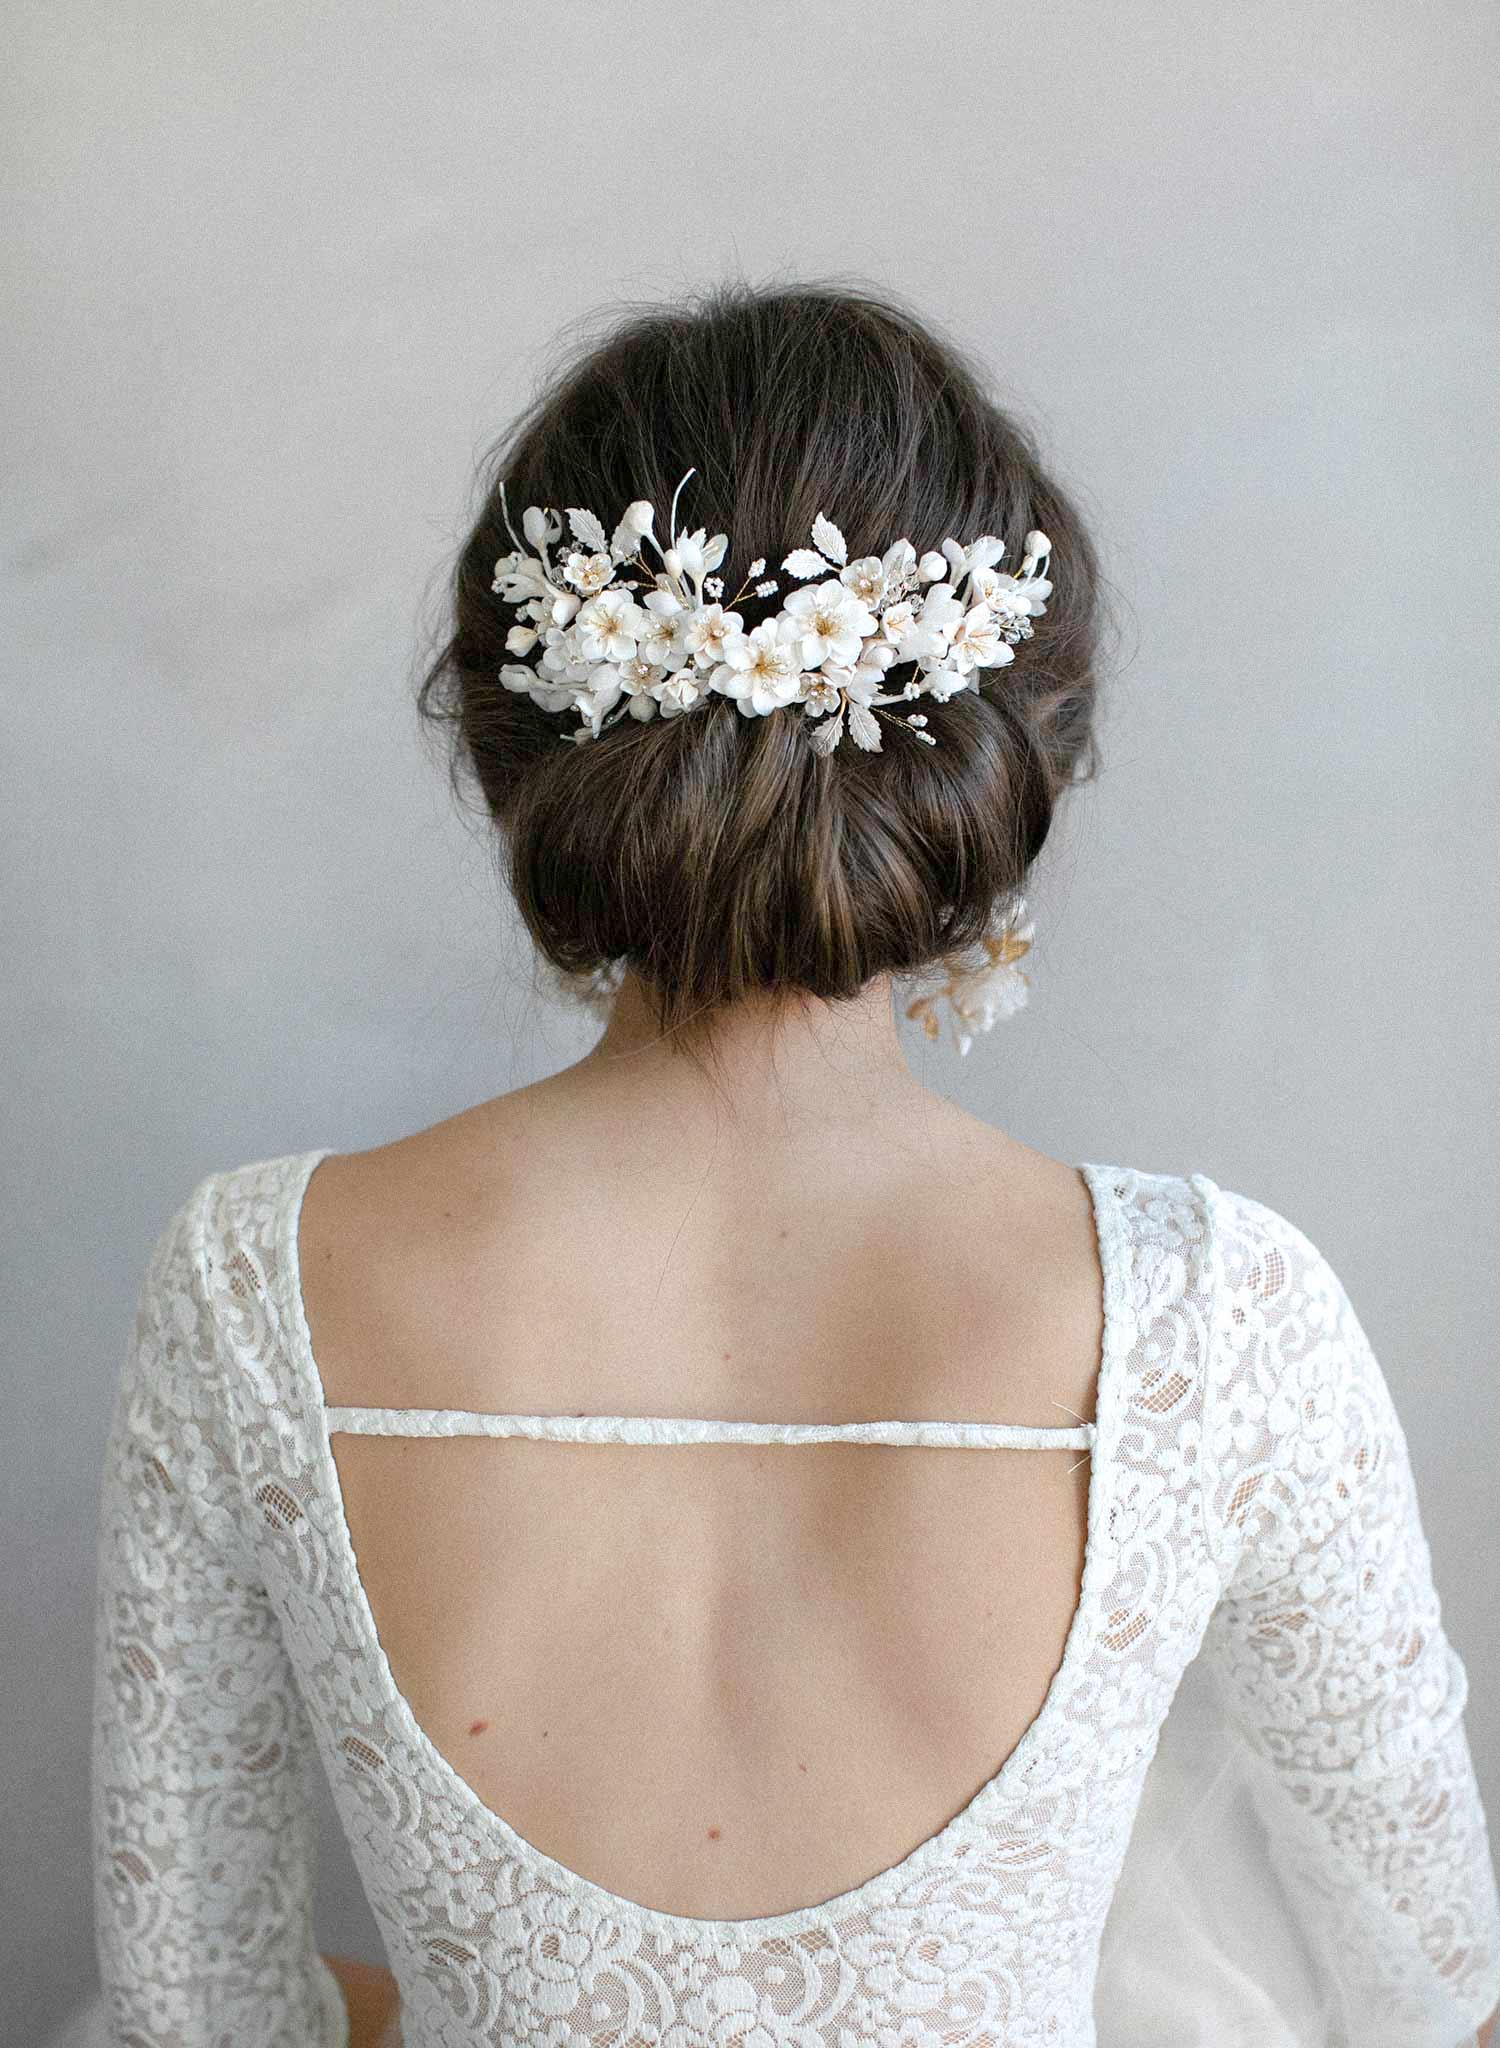 939-creamy-decadence-bridal-flower-headpiece-hair-twigsandhoney_0032-MAIN.jpg